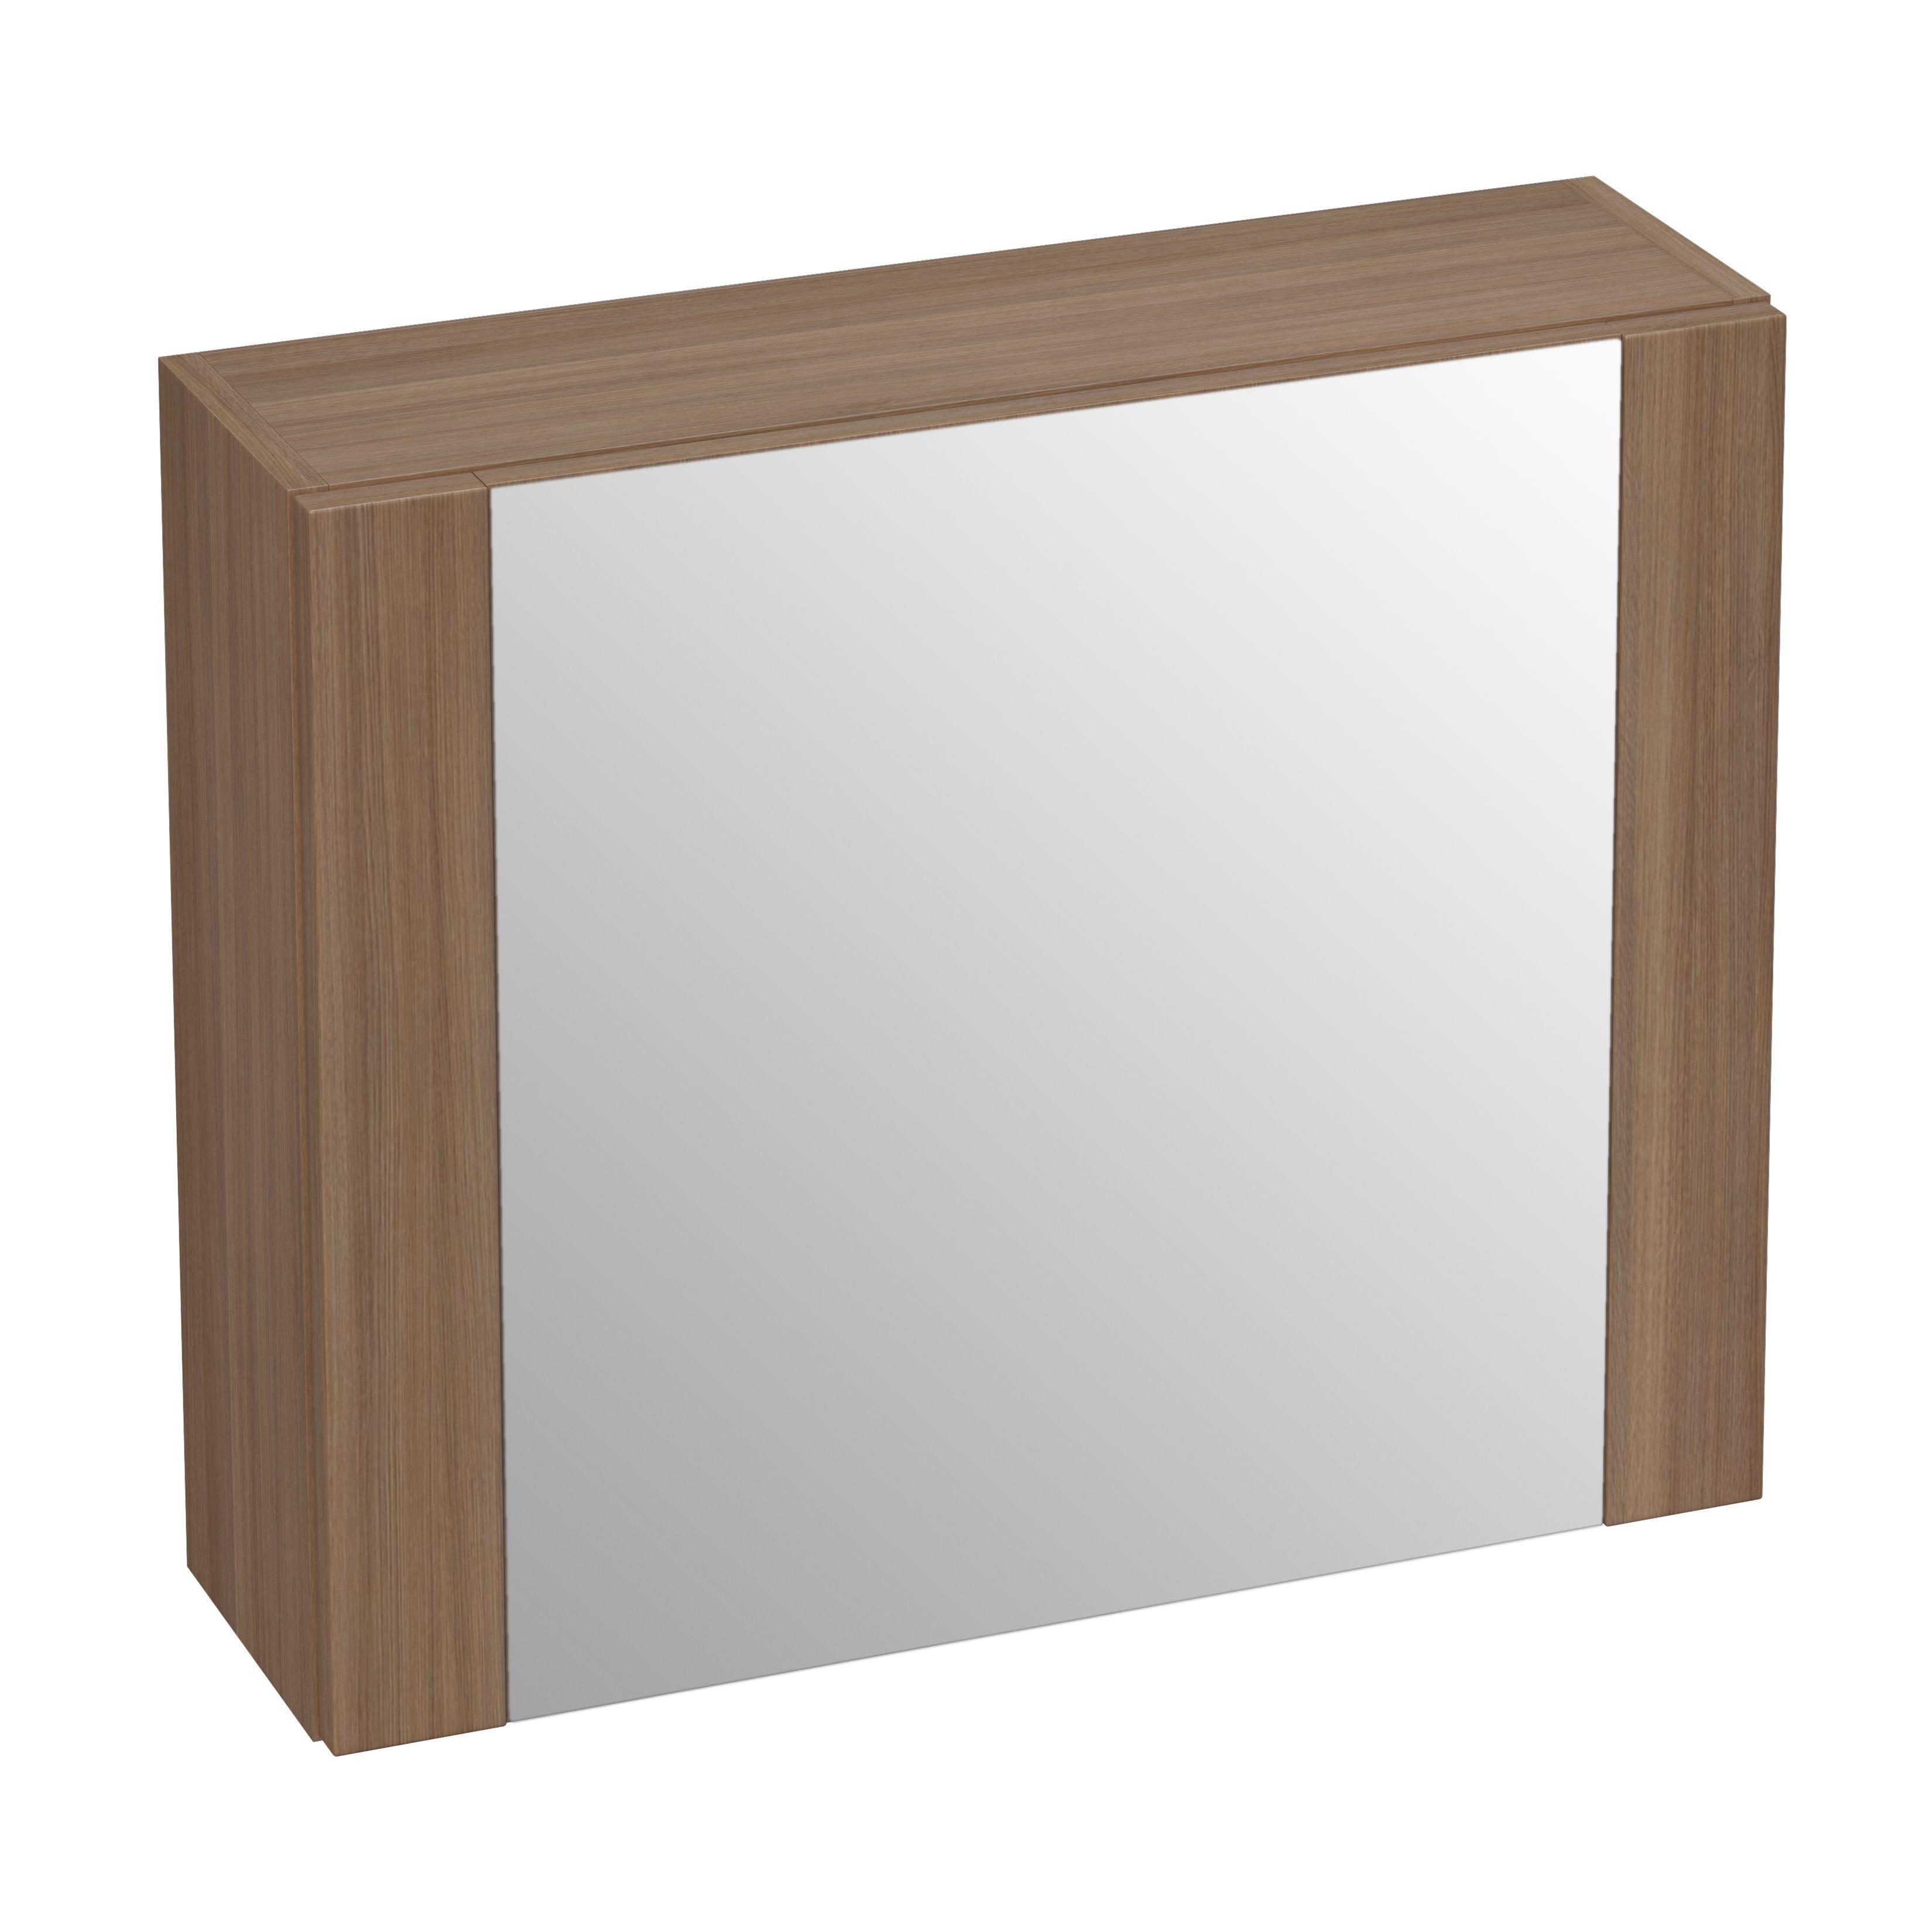 mirror effect furniture. cooke u0026 lewis romana single door oak effect medium mirror cabinet furniture